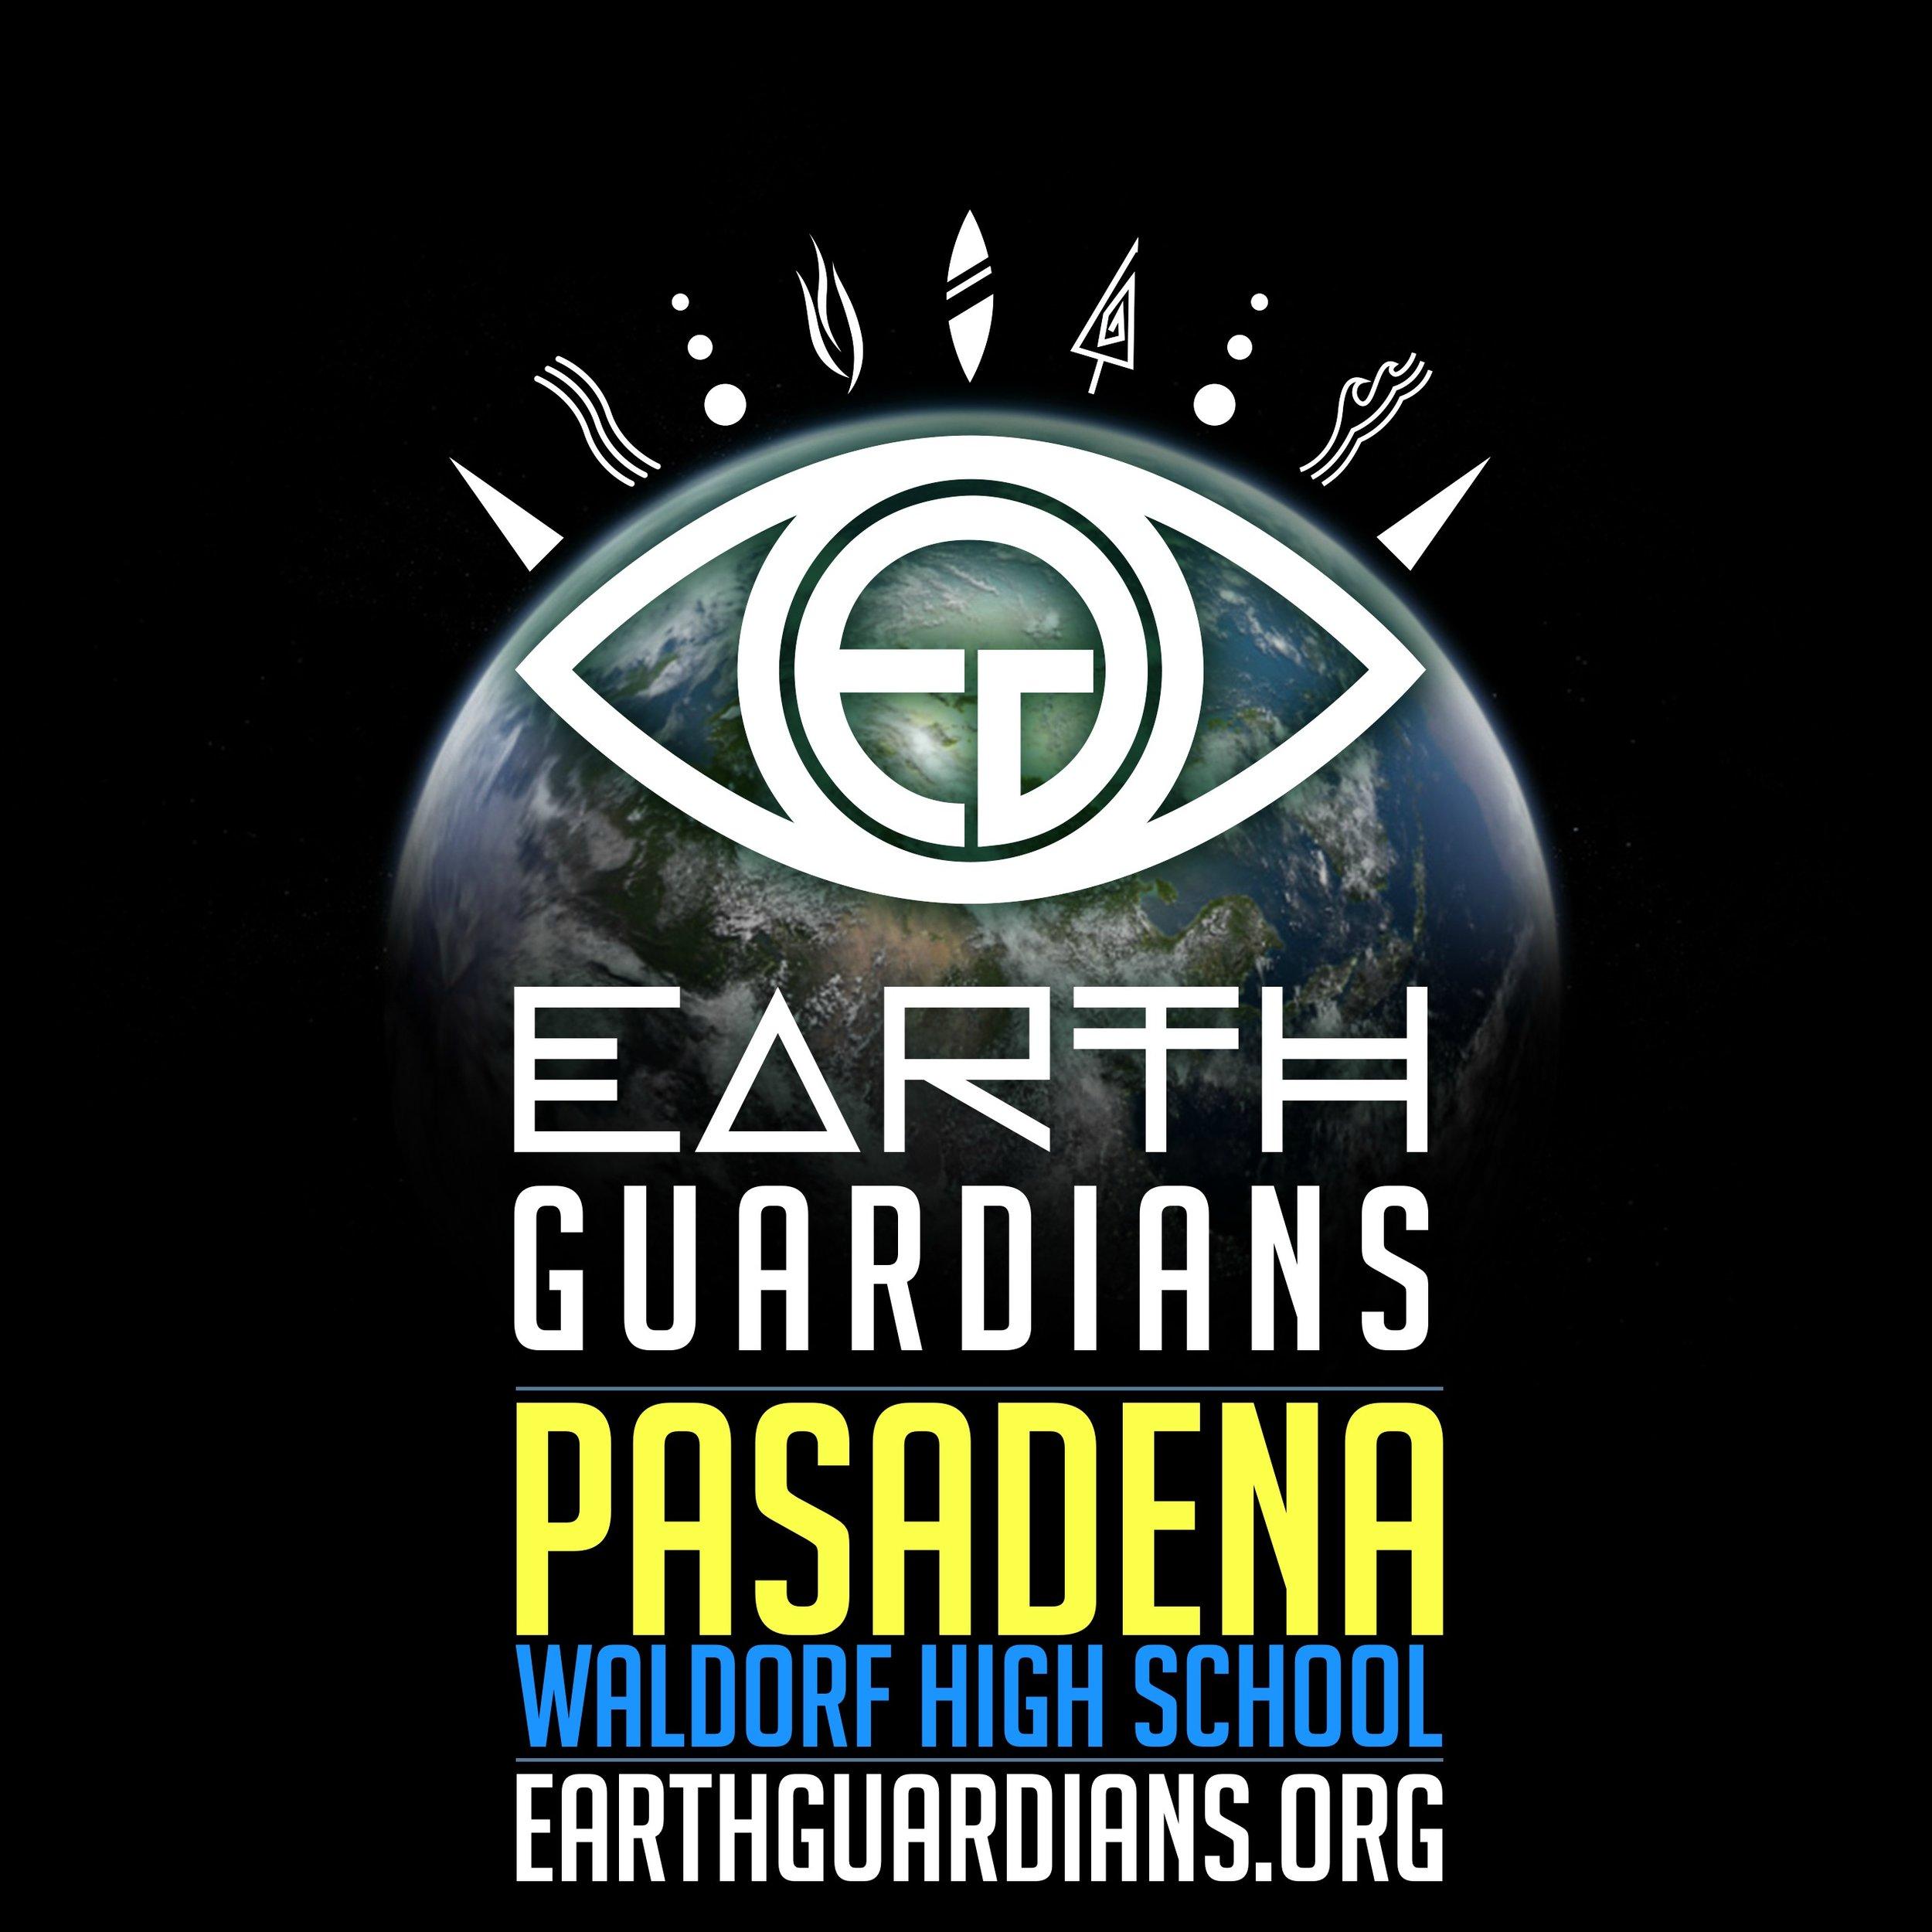 EG_crew logo PASADENA HS.jpg